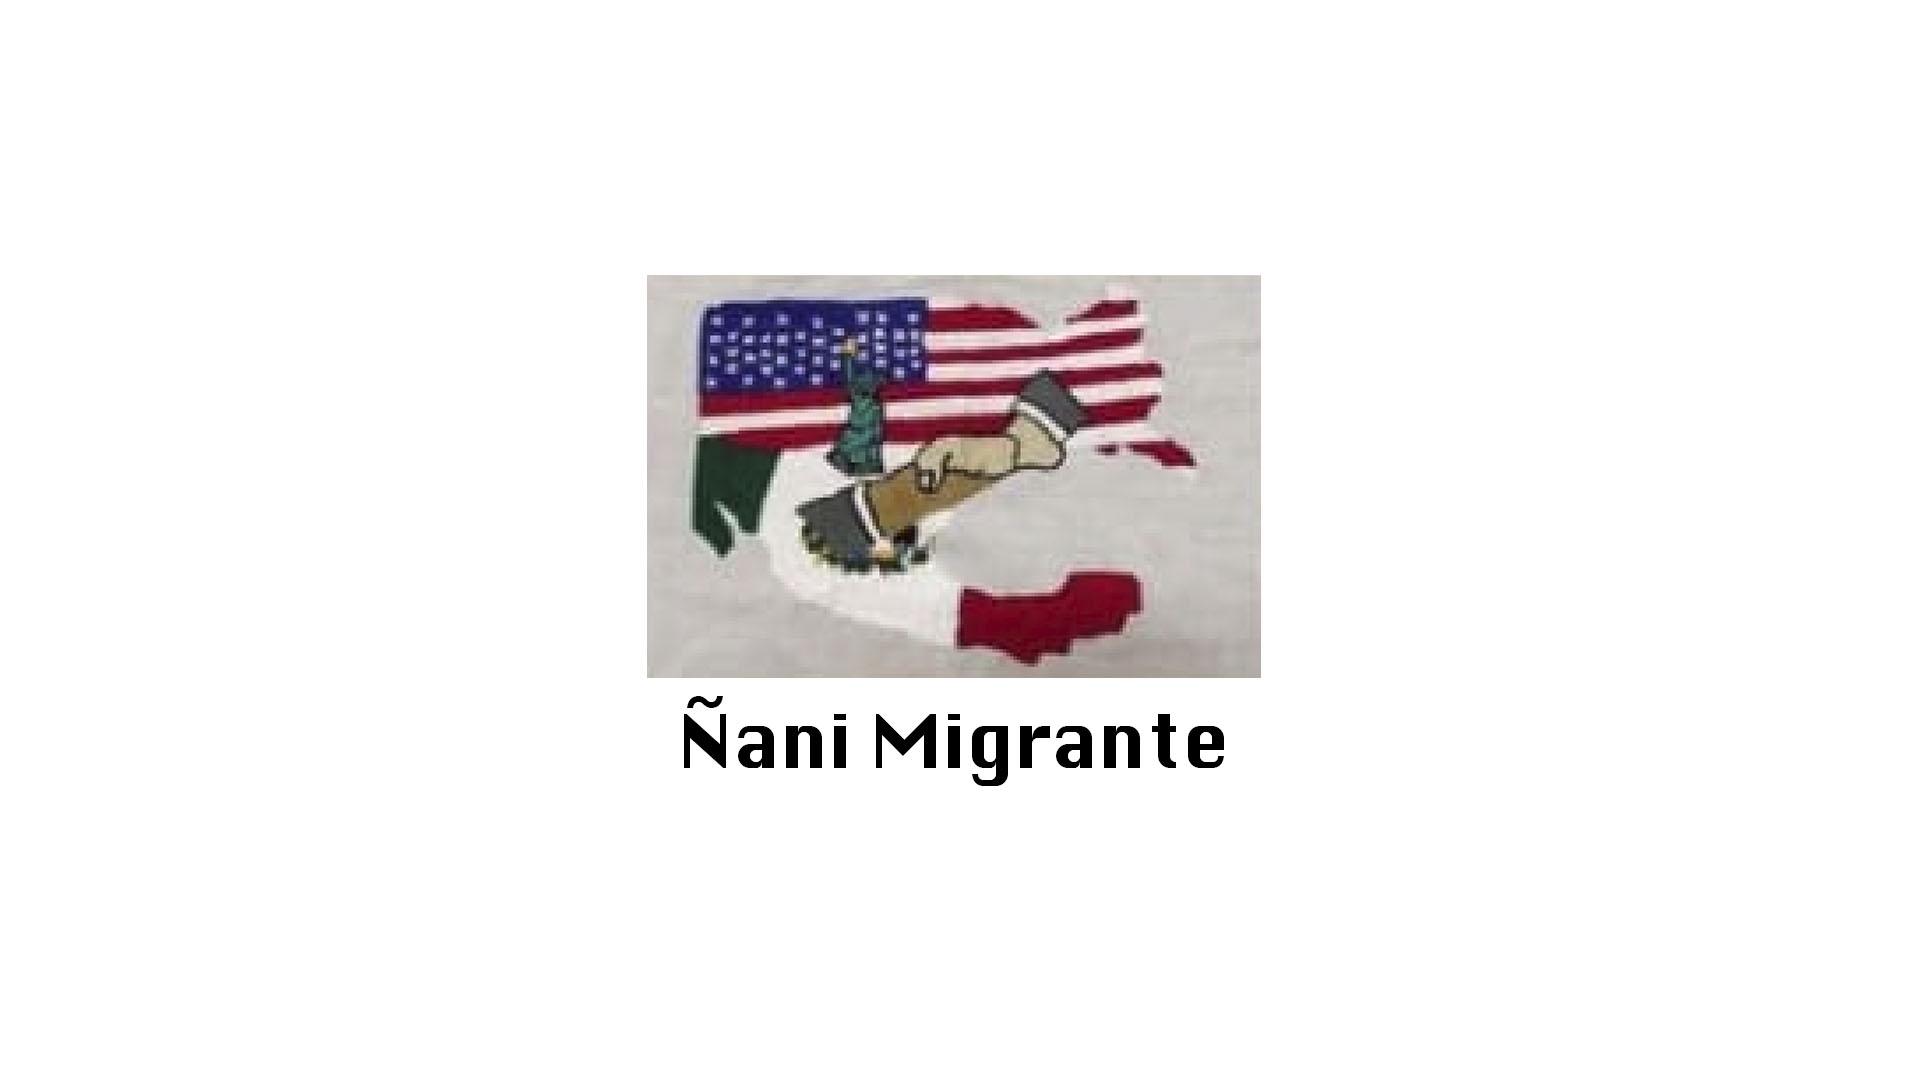 Ñanimigrante.jpg